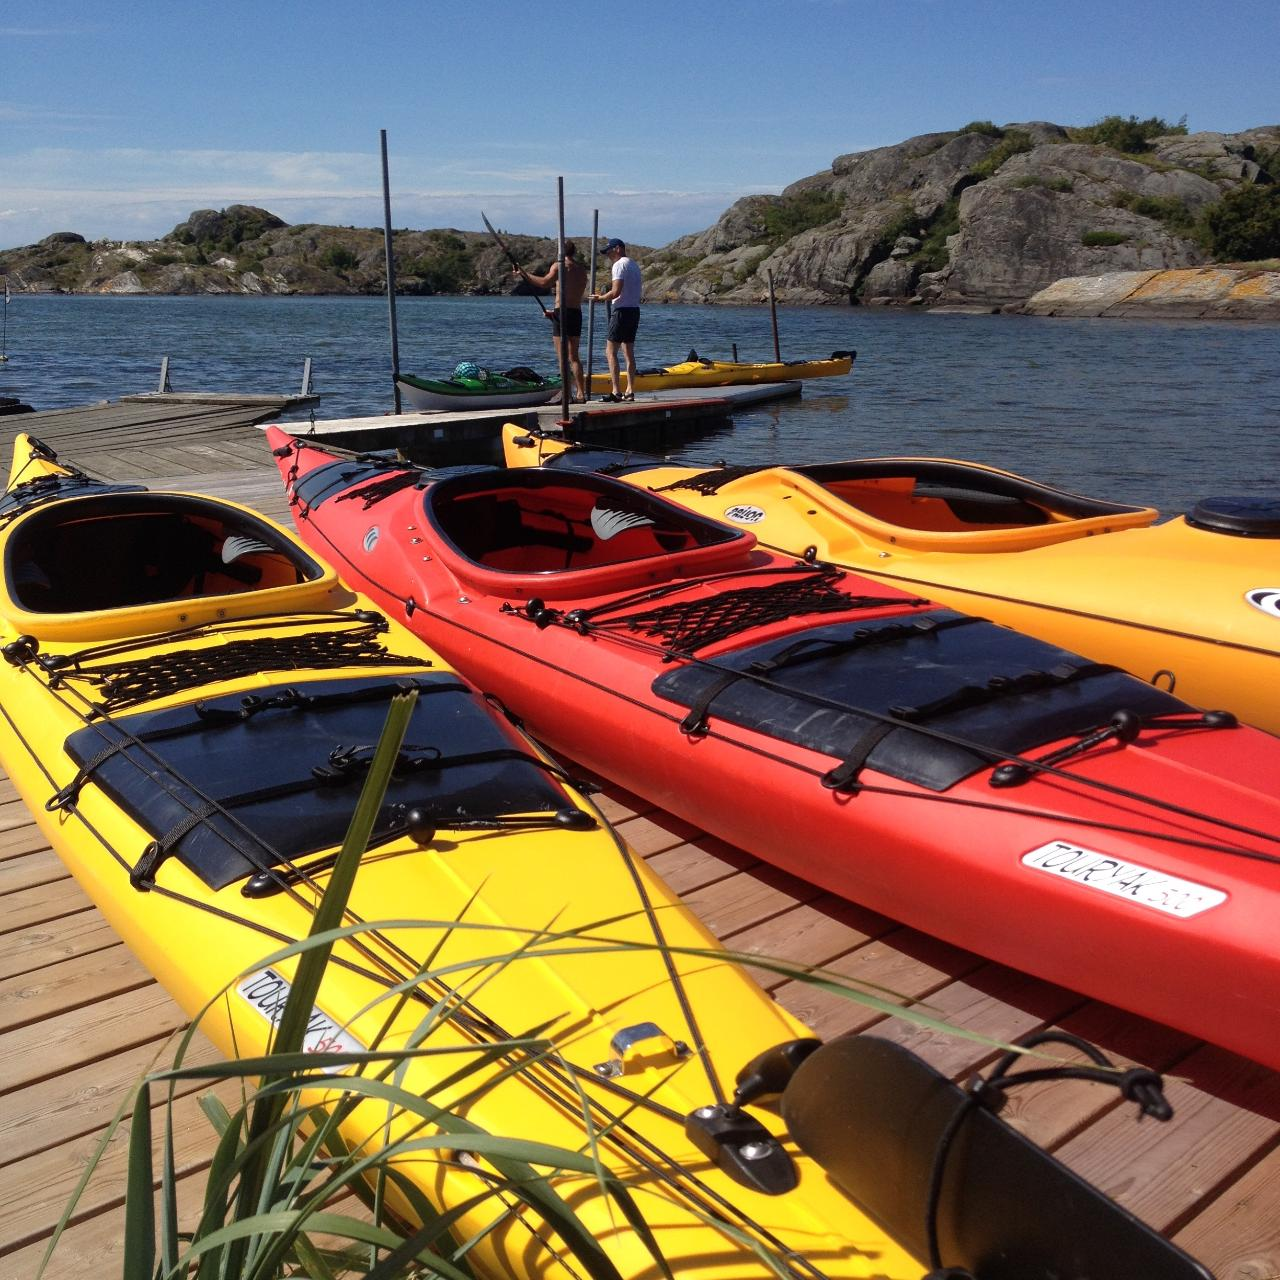 Dubbelkajak plast 1 VECKA (4-7 DYGN) Double kayak plastic 1 WEEK (4-7 DAYS)